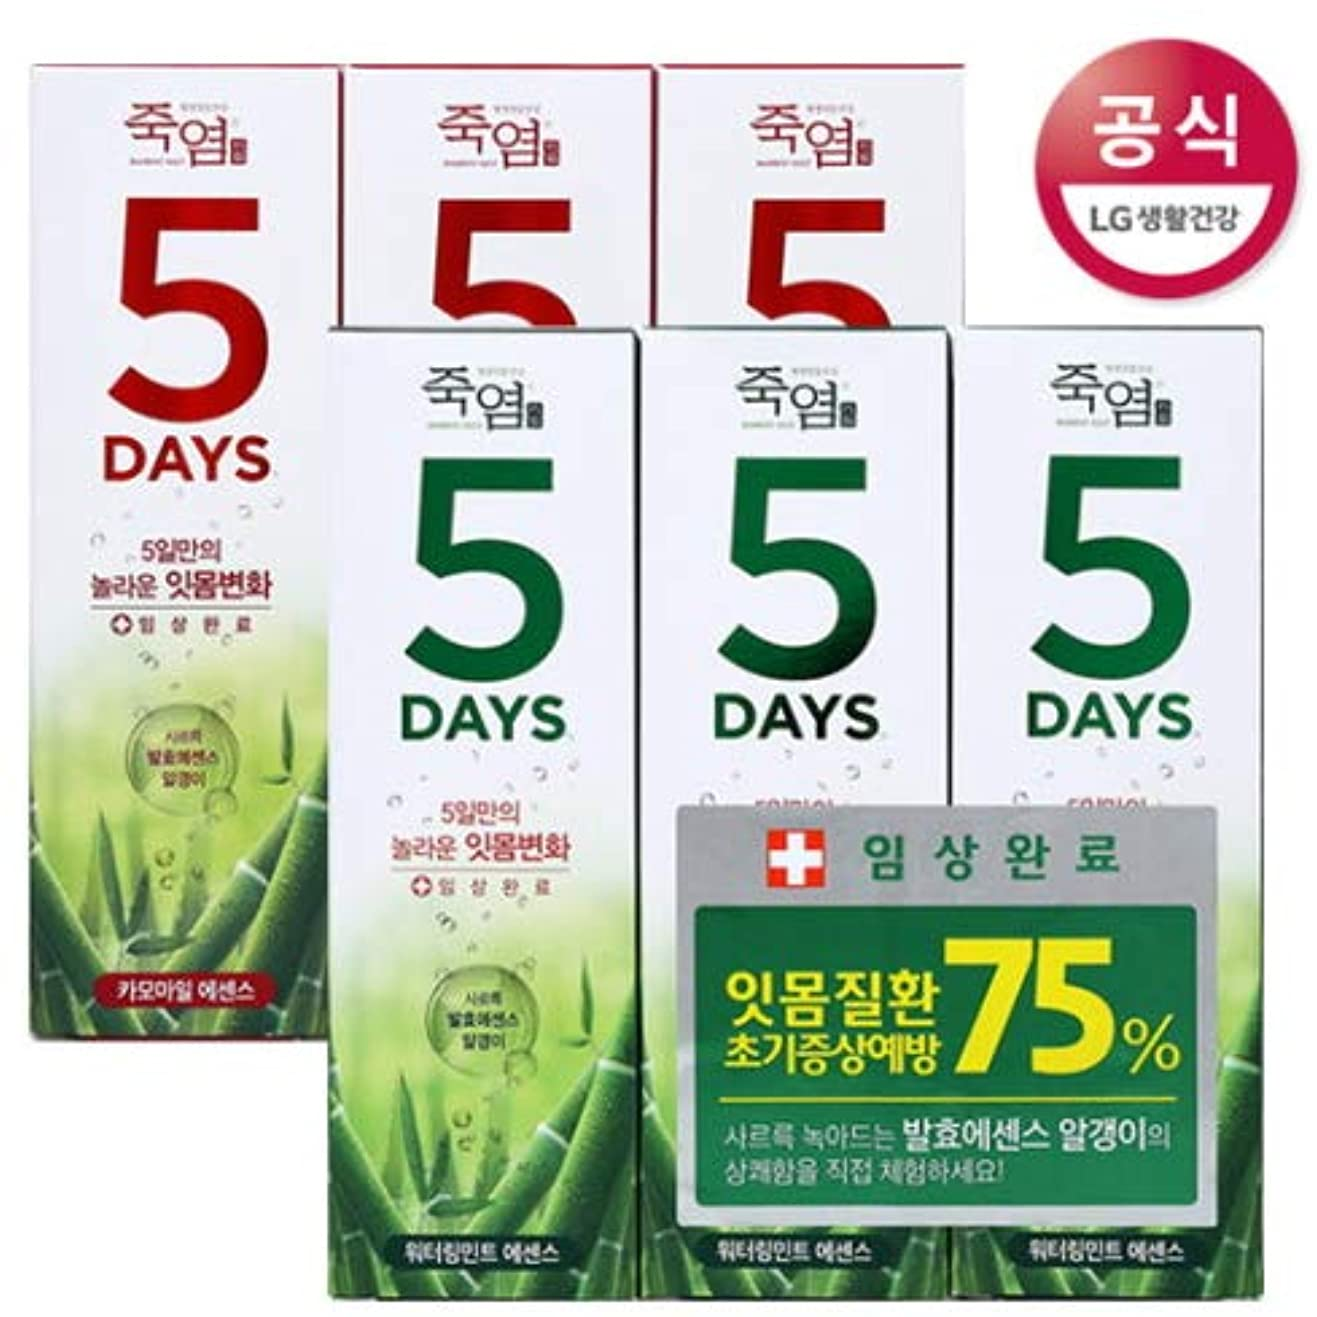 周波数中に空[LG HnB] Bamboo Salt 5days Toothpaste /竹塩5days歯磨き粉 100gx6個(海外直送品)